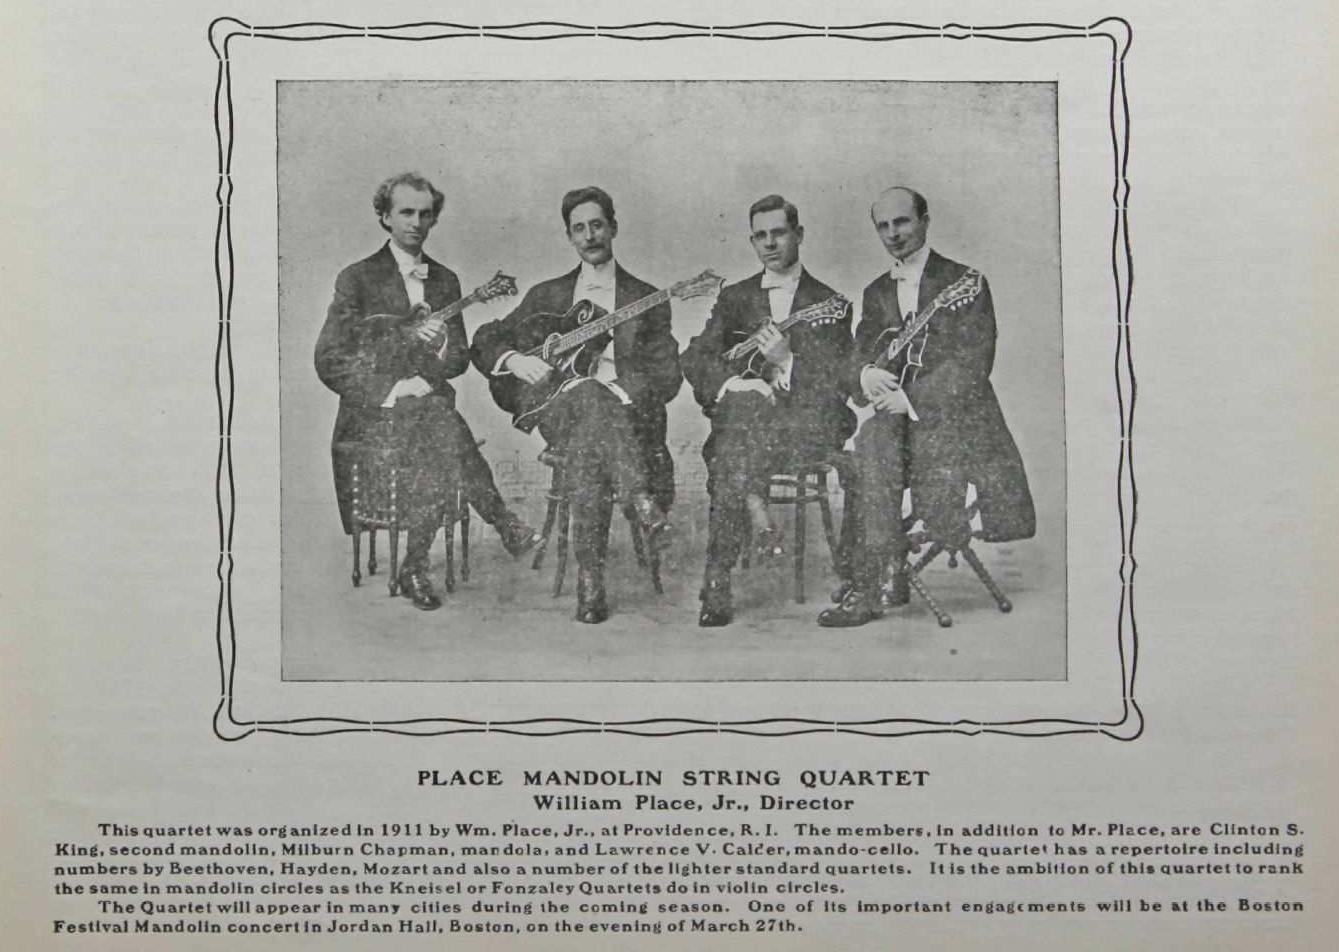 Place Mandolin String Quartet